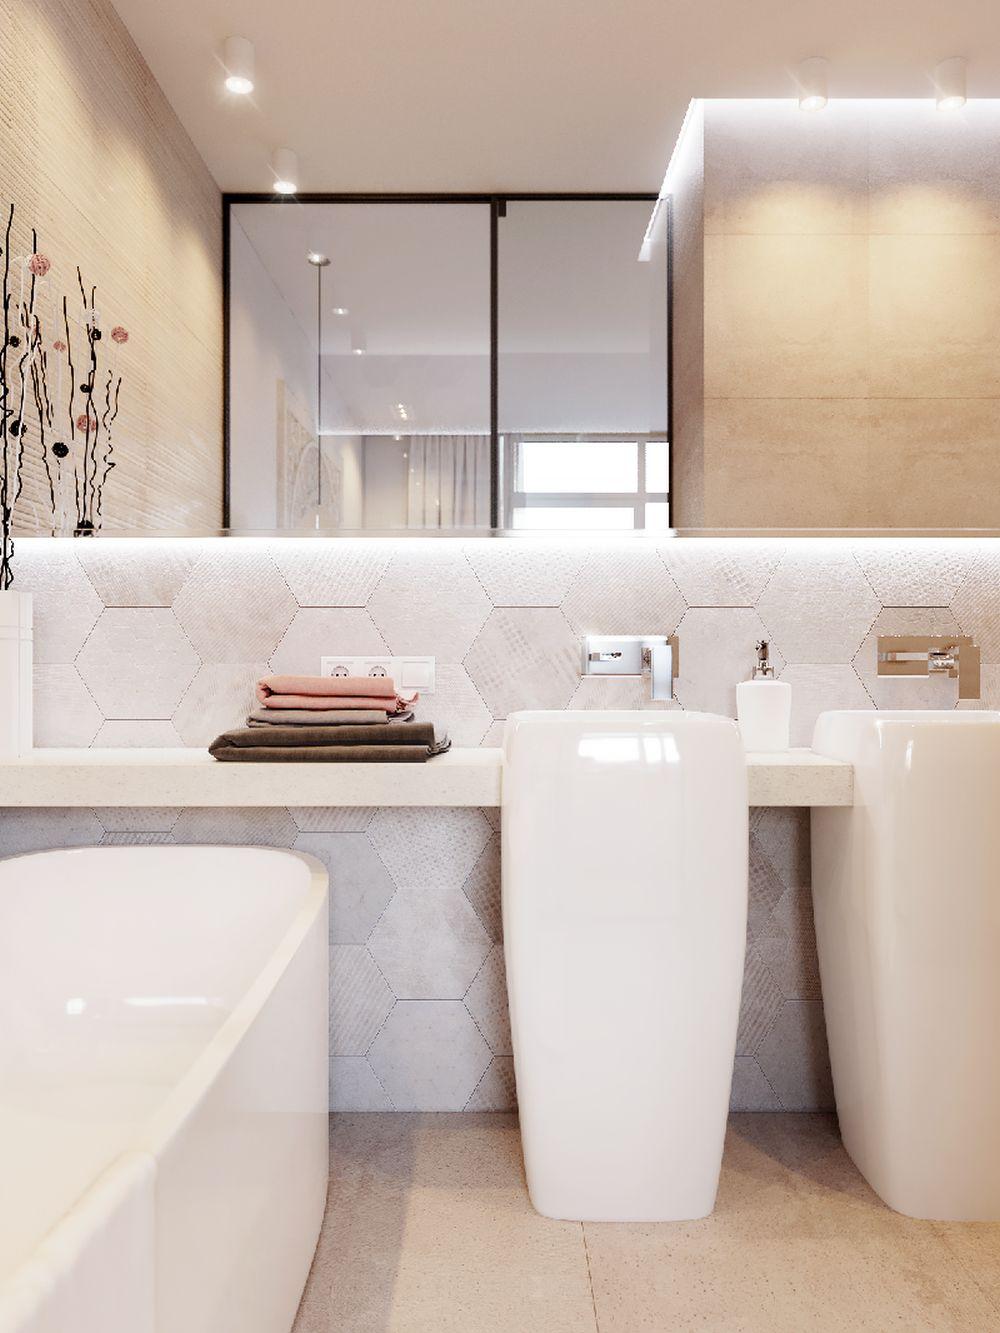 adelaparvu.com despre apartament in nuante delicate, designer Dima Kravtsov (16)